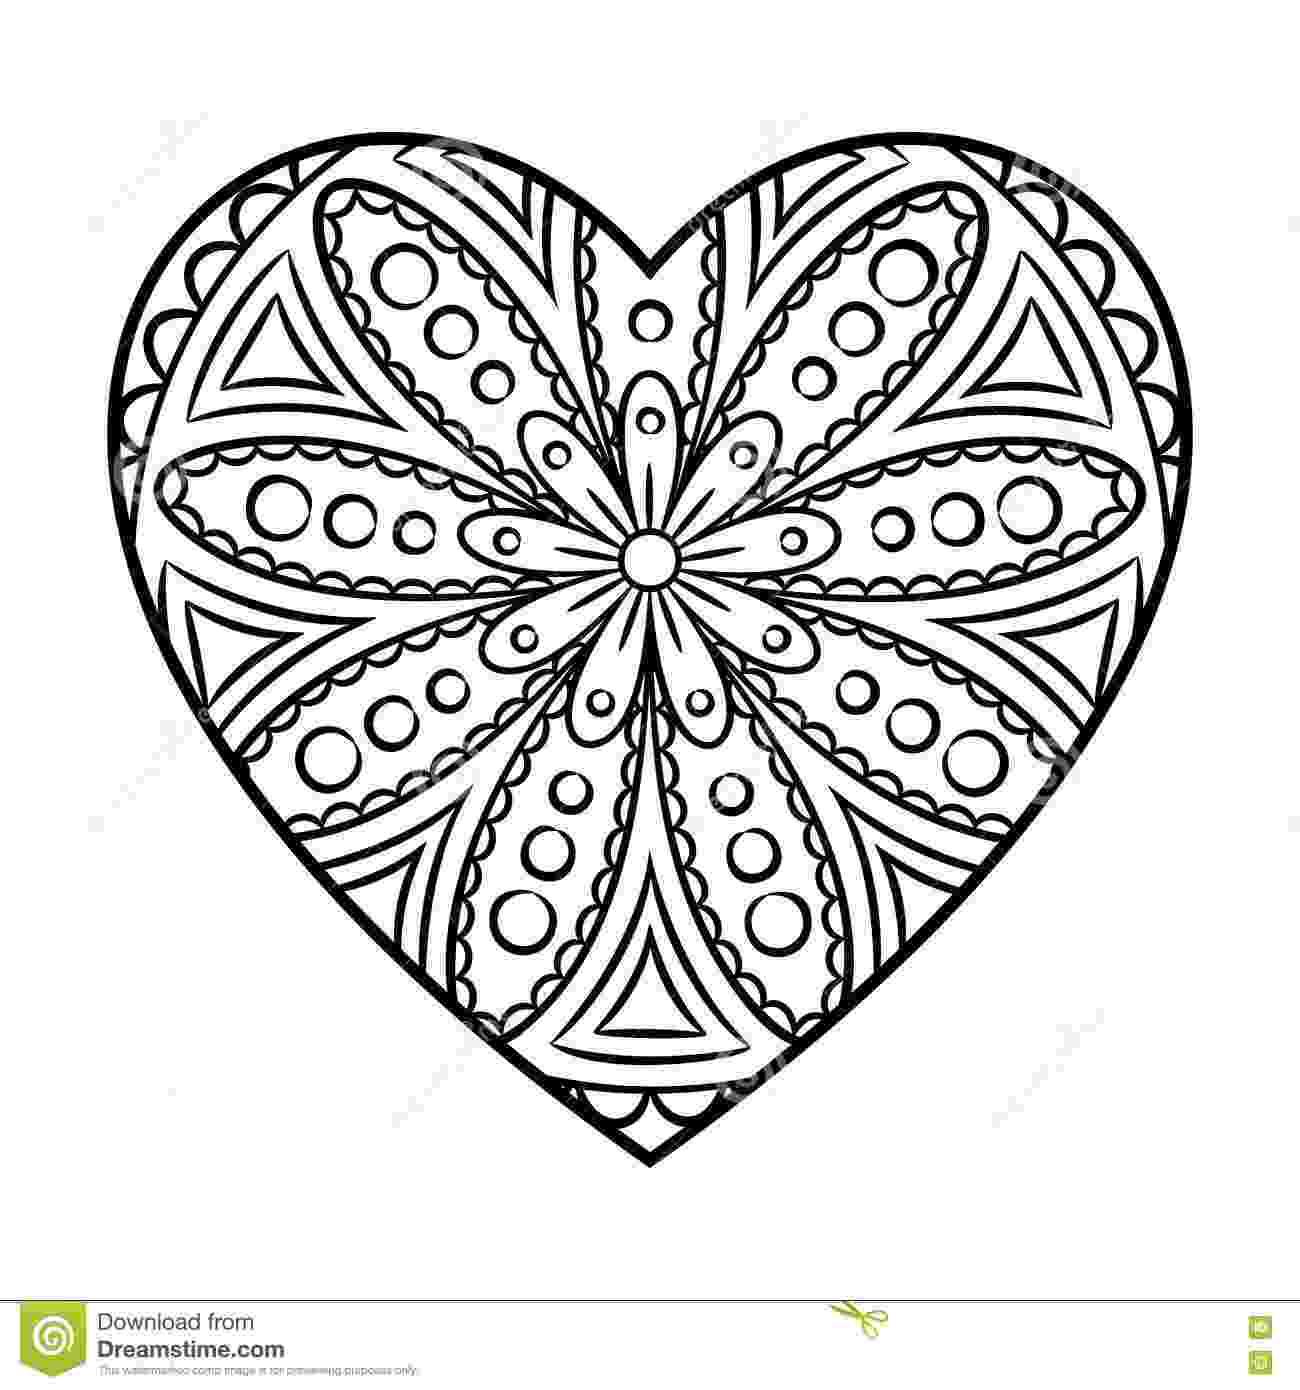 mandala heart 19 best images about mandala coloring pages on pinterest heart mandala